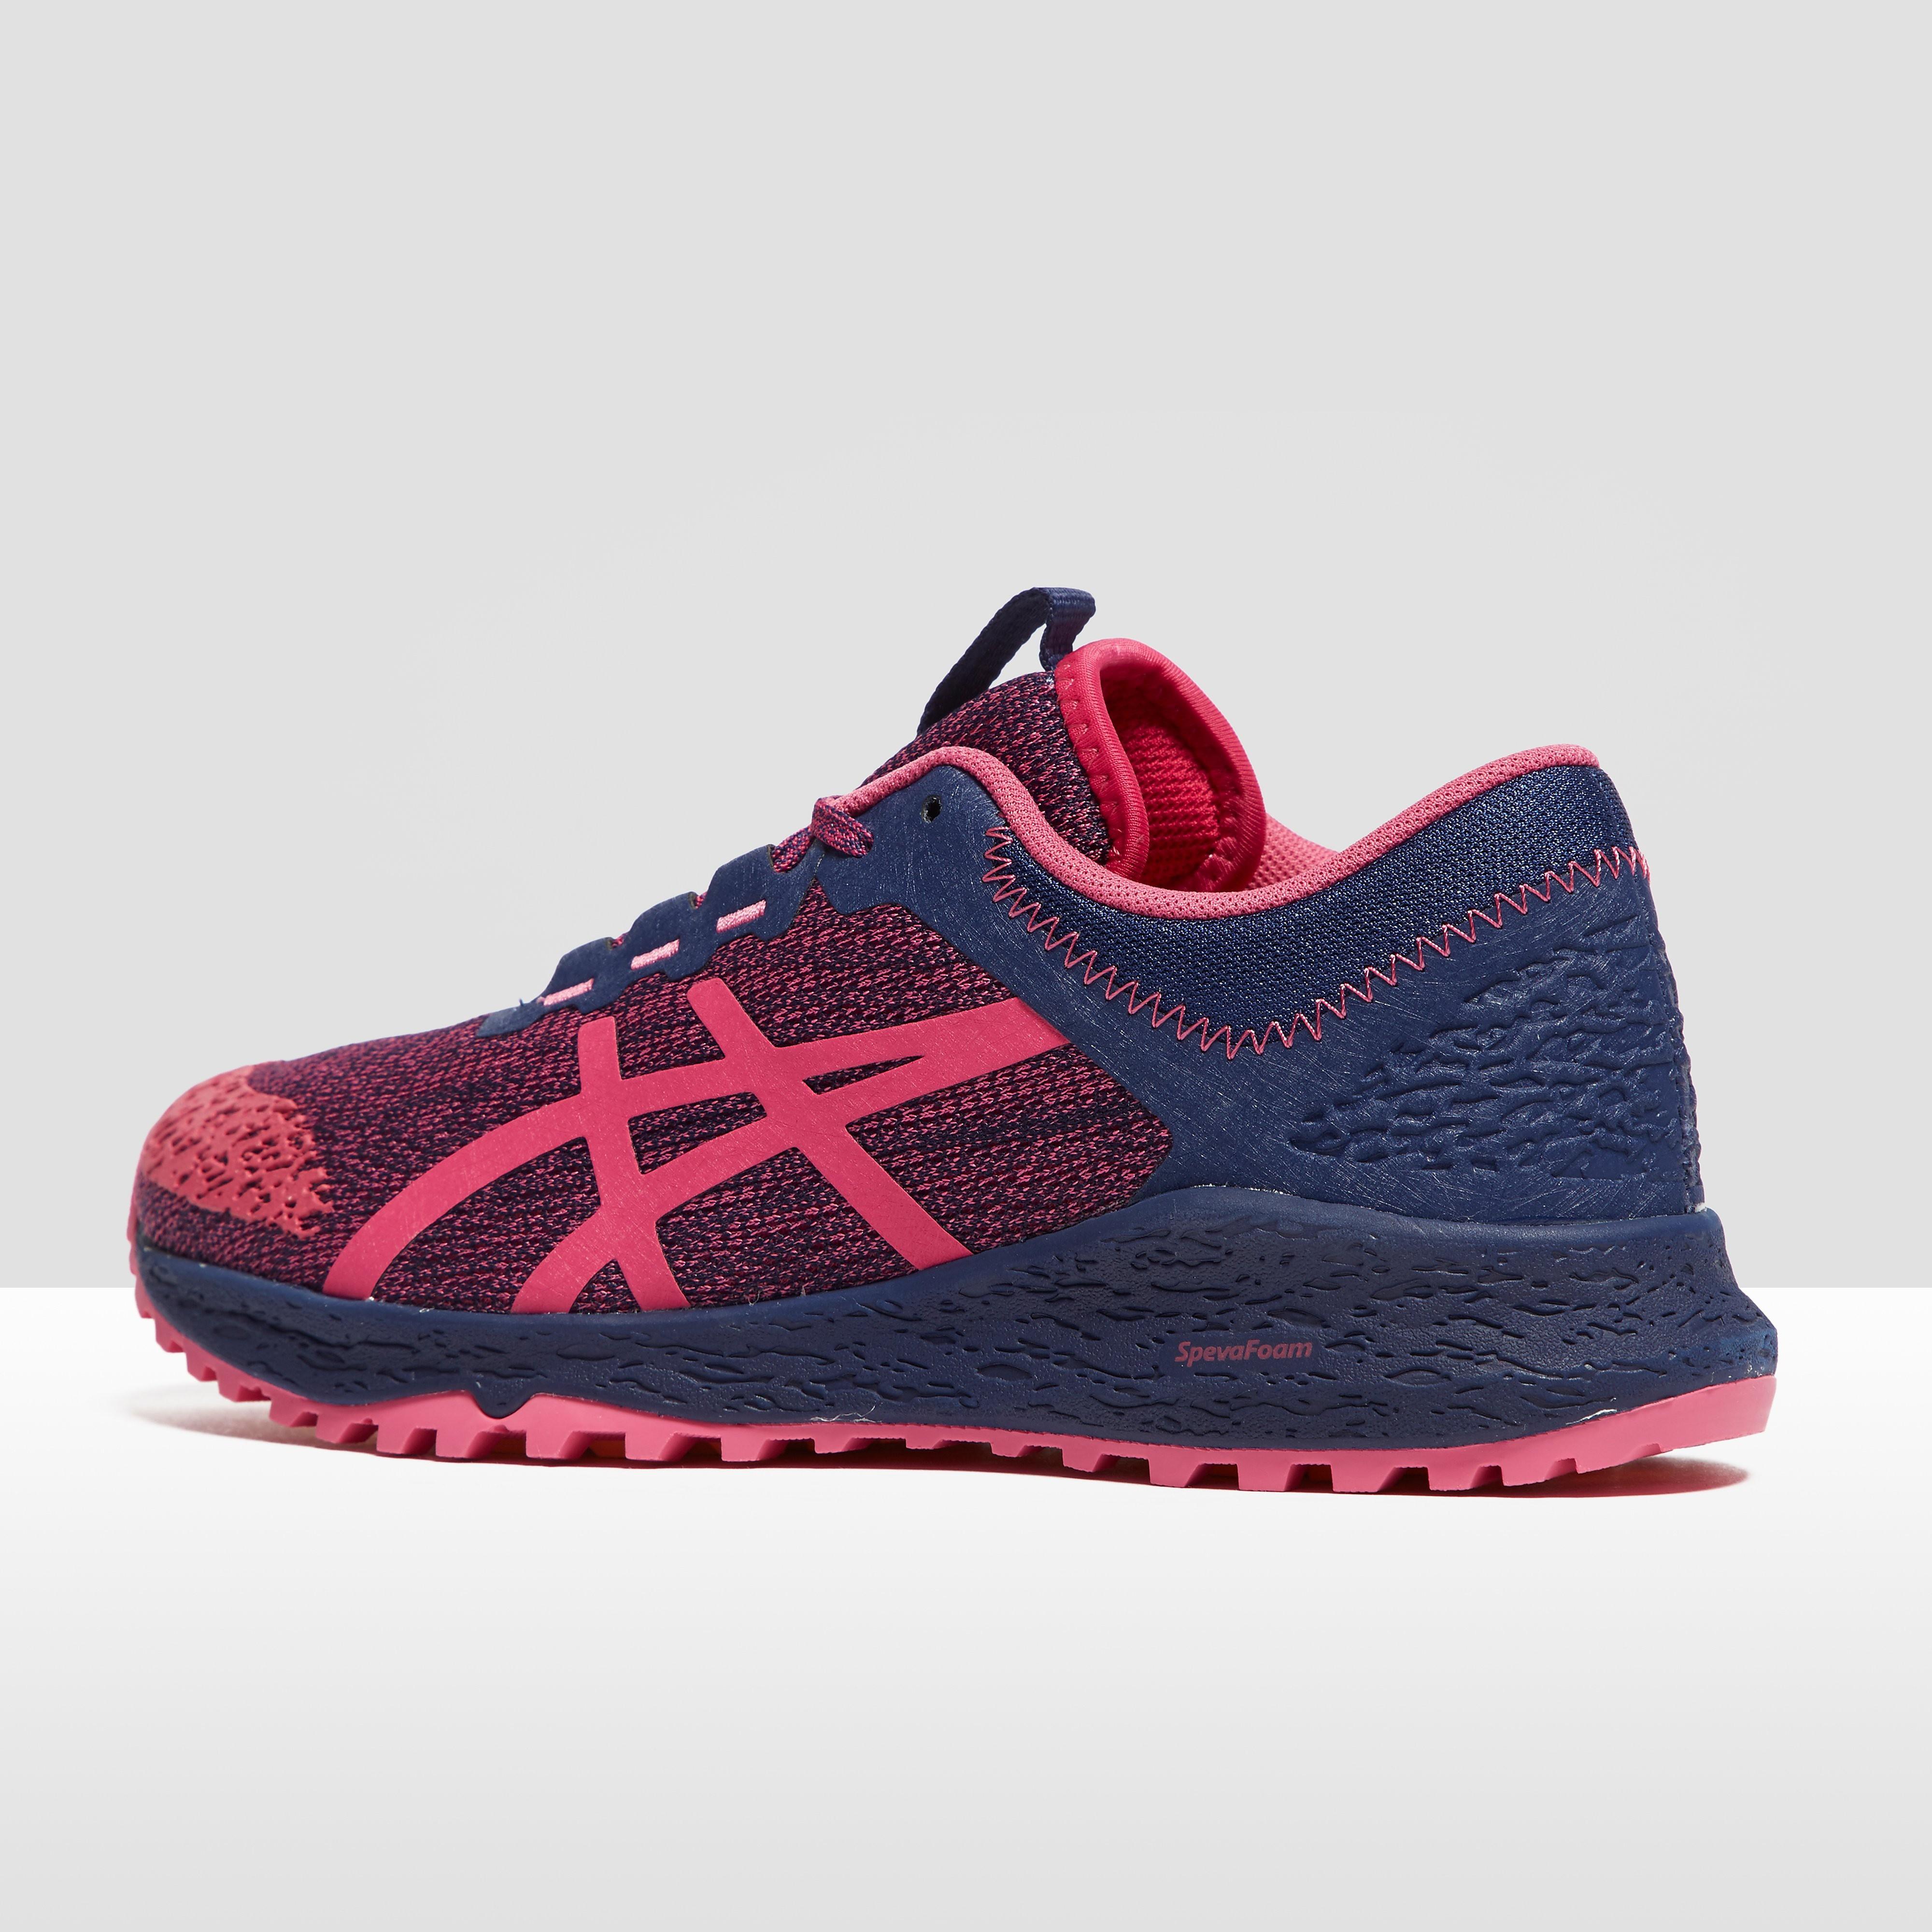 ASICS Alpine XT Women's Trail Shoe